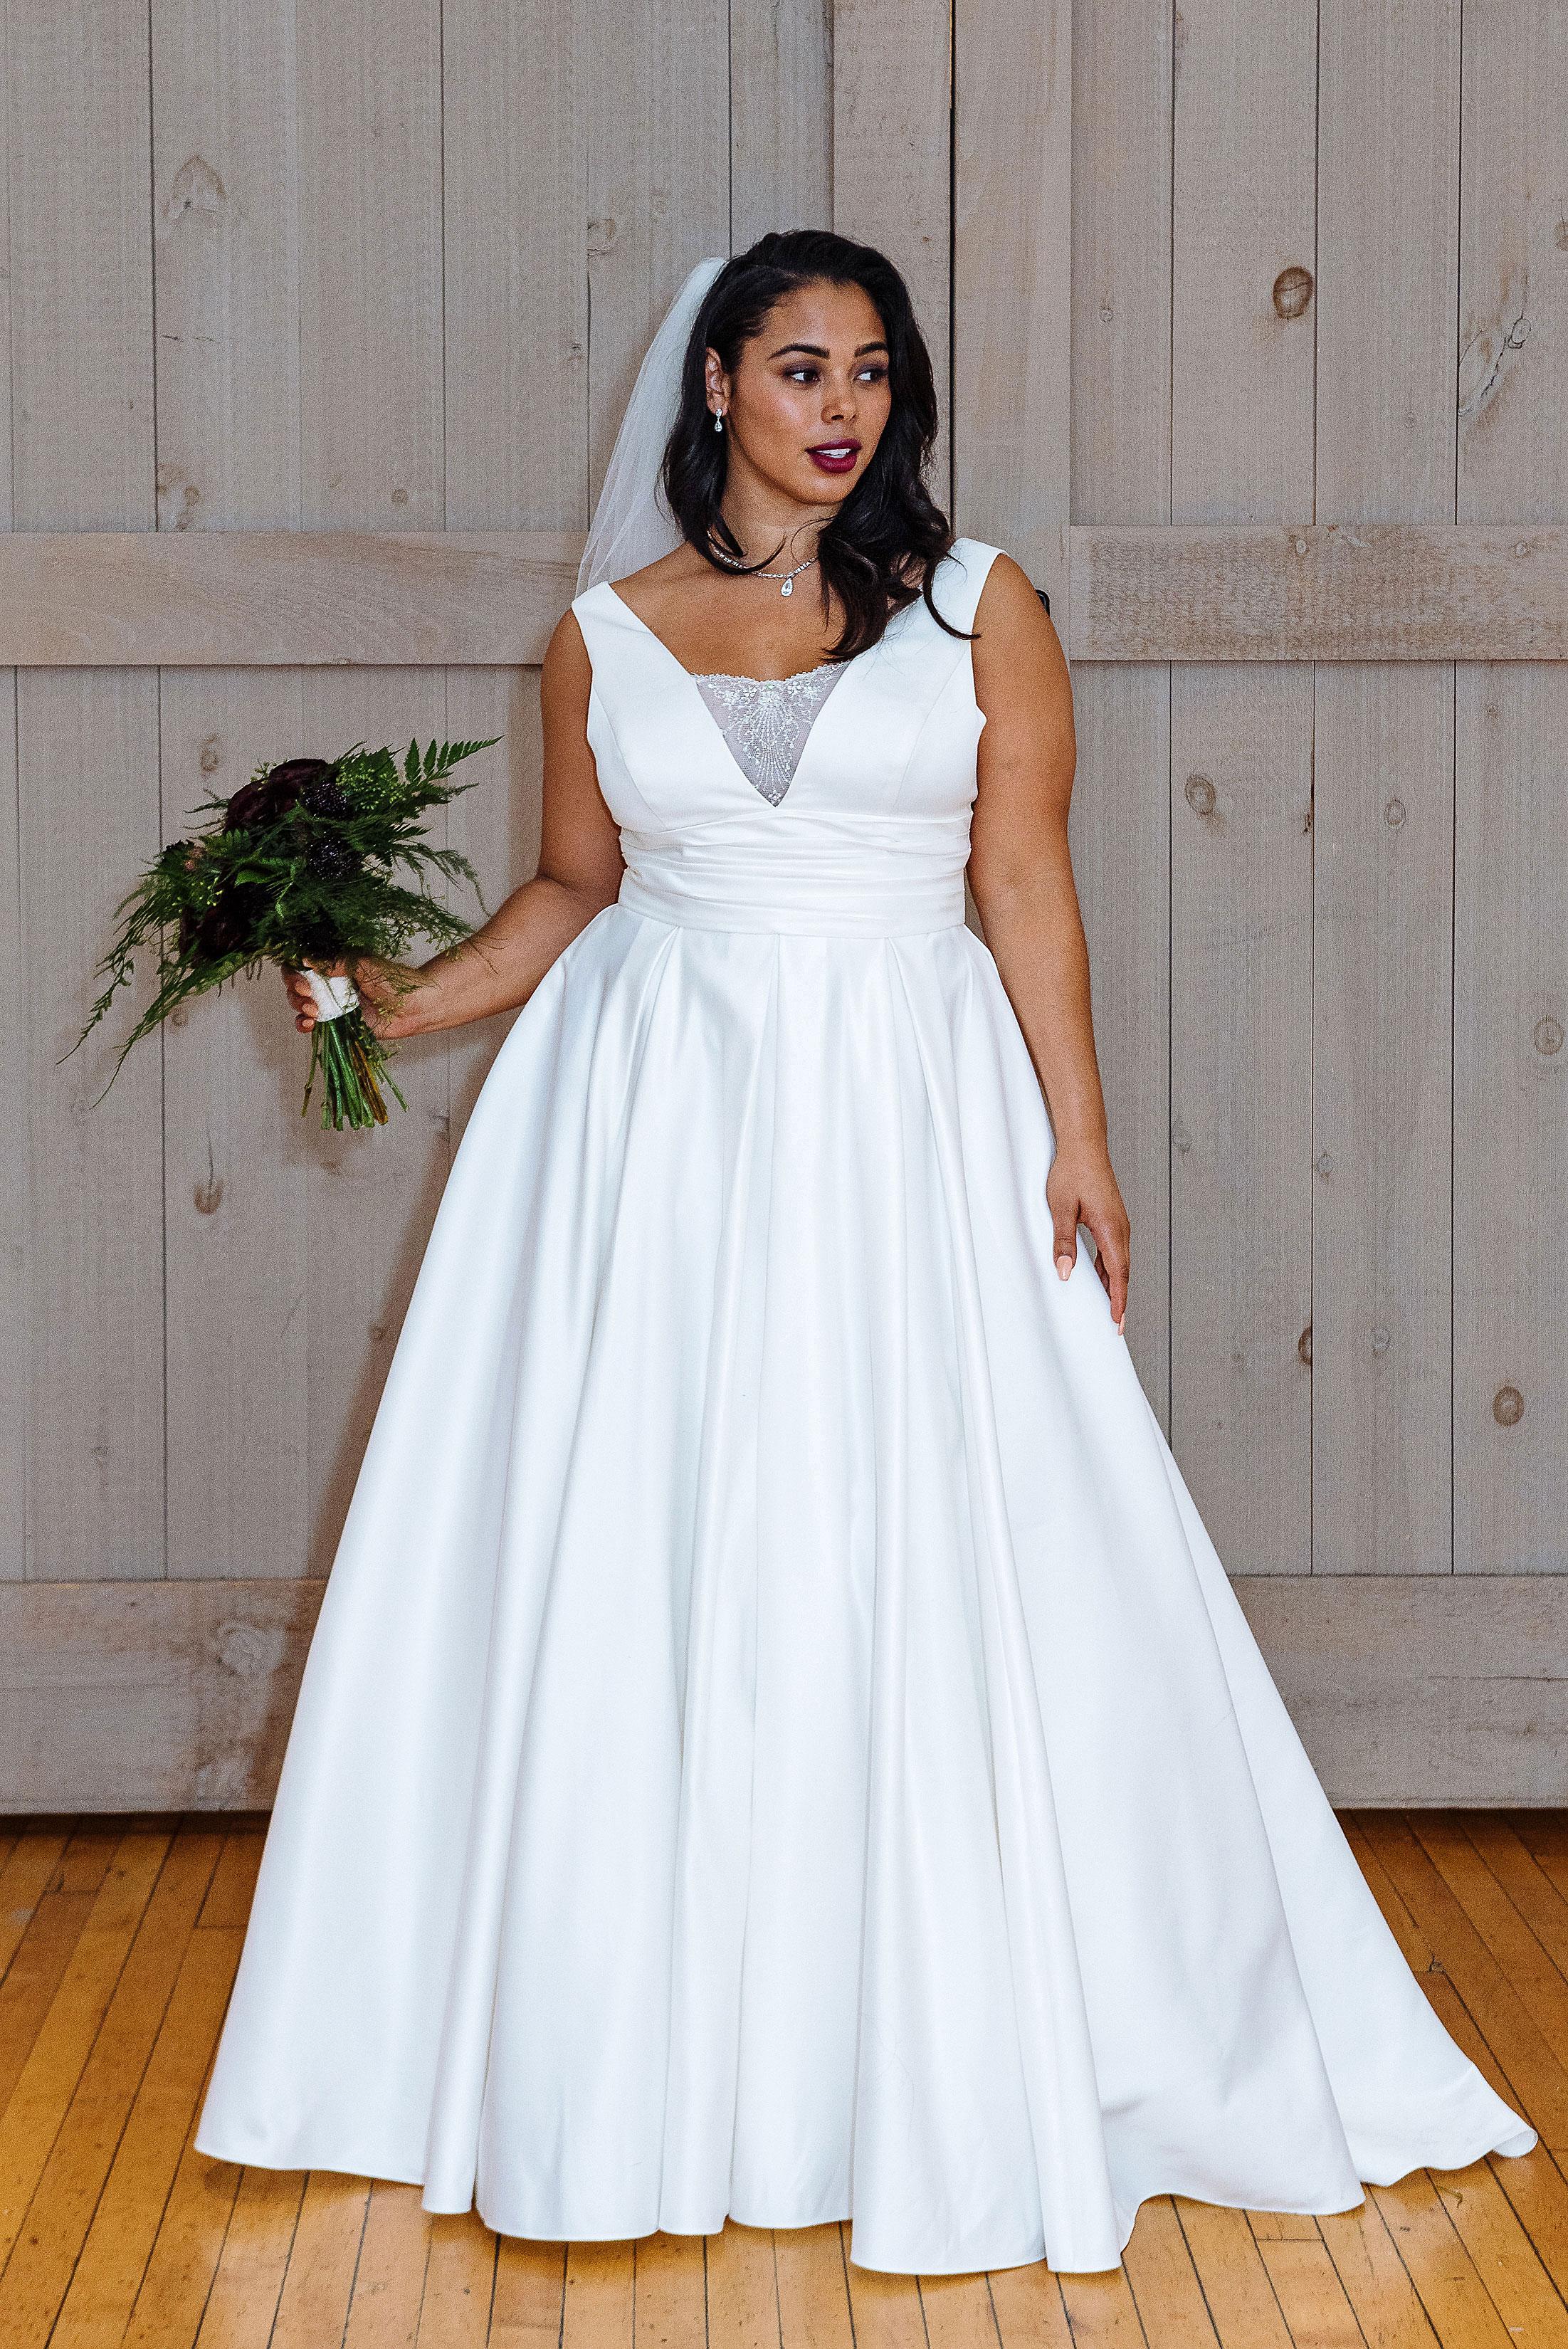 david's bridal v-neck with veil wedding dress spring 2018